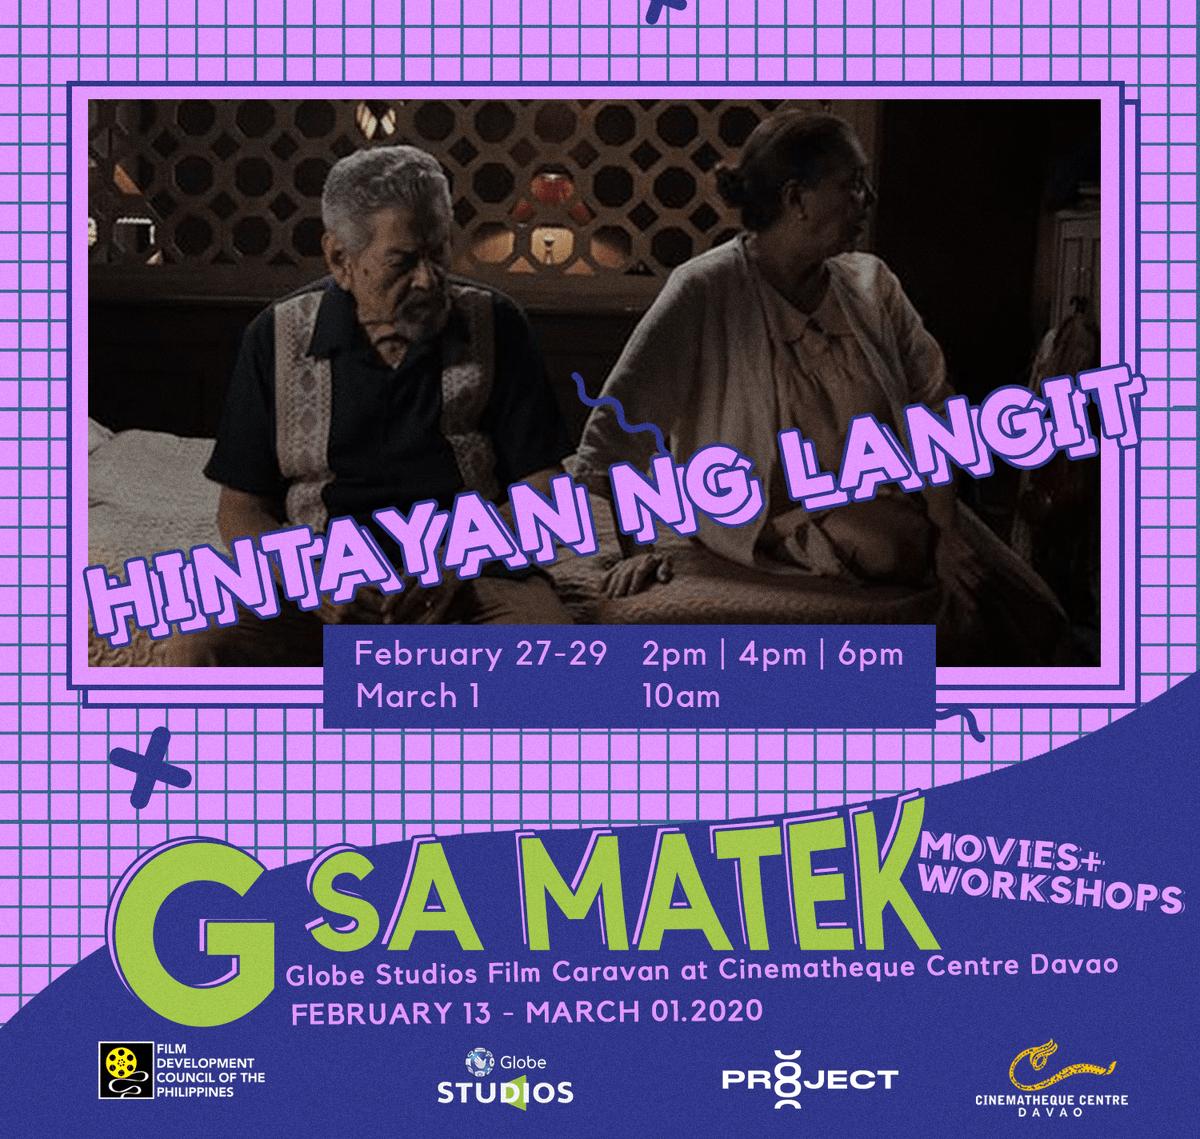 TOMORROW:  𝐇𝐢𝐧𝐭𝐚𝐲𝐚𝐧 𝐍𝐠 𝐋𝐚𝐧𝐠𝐢𝐭   2 PM   |   4 PM   |   6 PM  Don't miss the chance to watch it on the big screen!  #GSaMatekpic.twitter.com/7DeqJjdG4Z